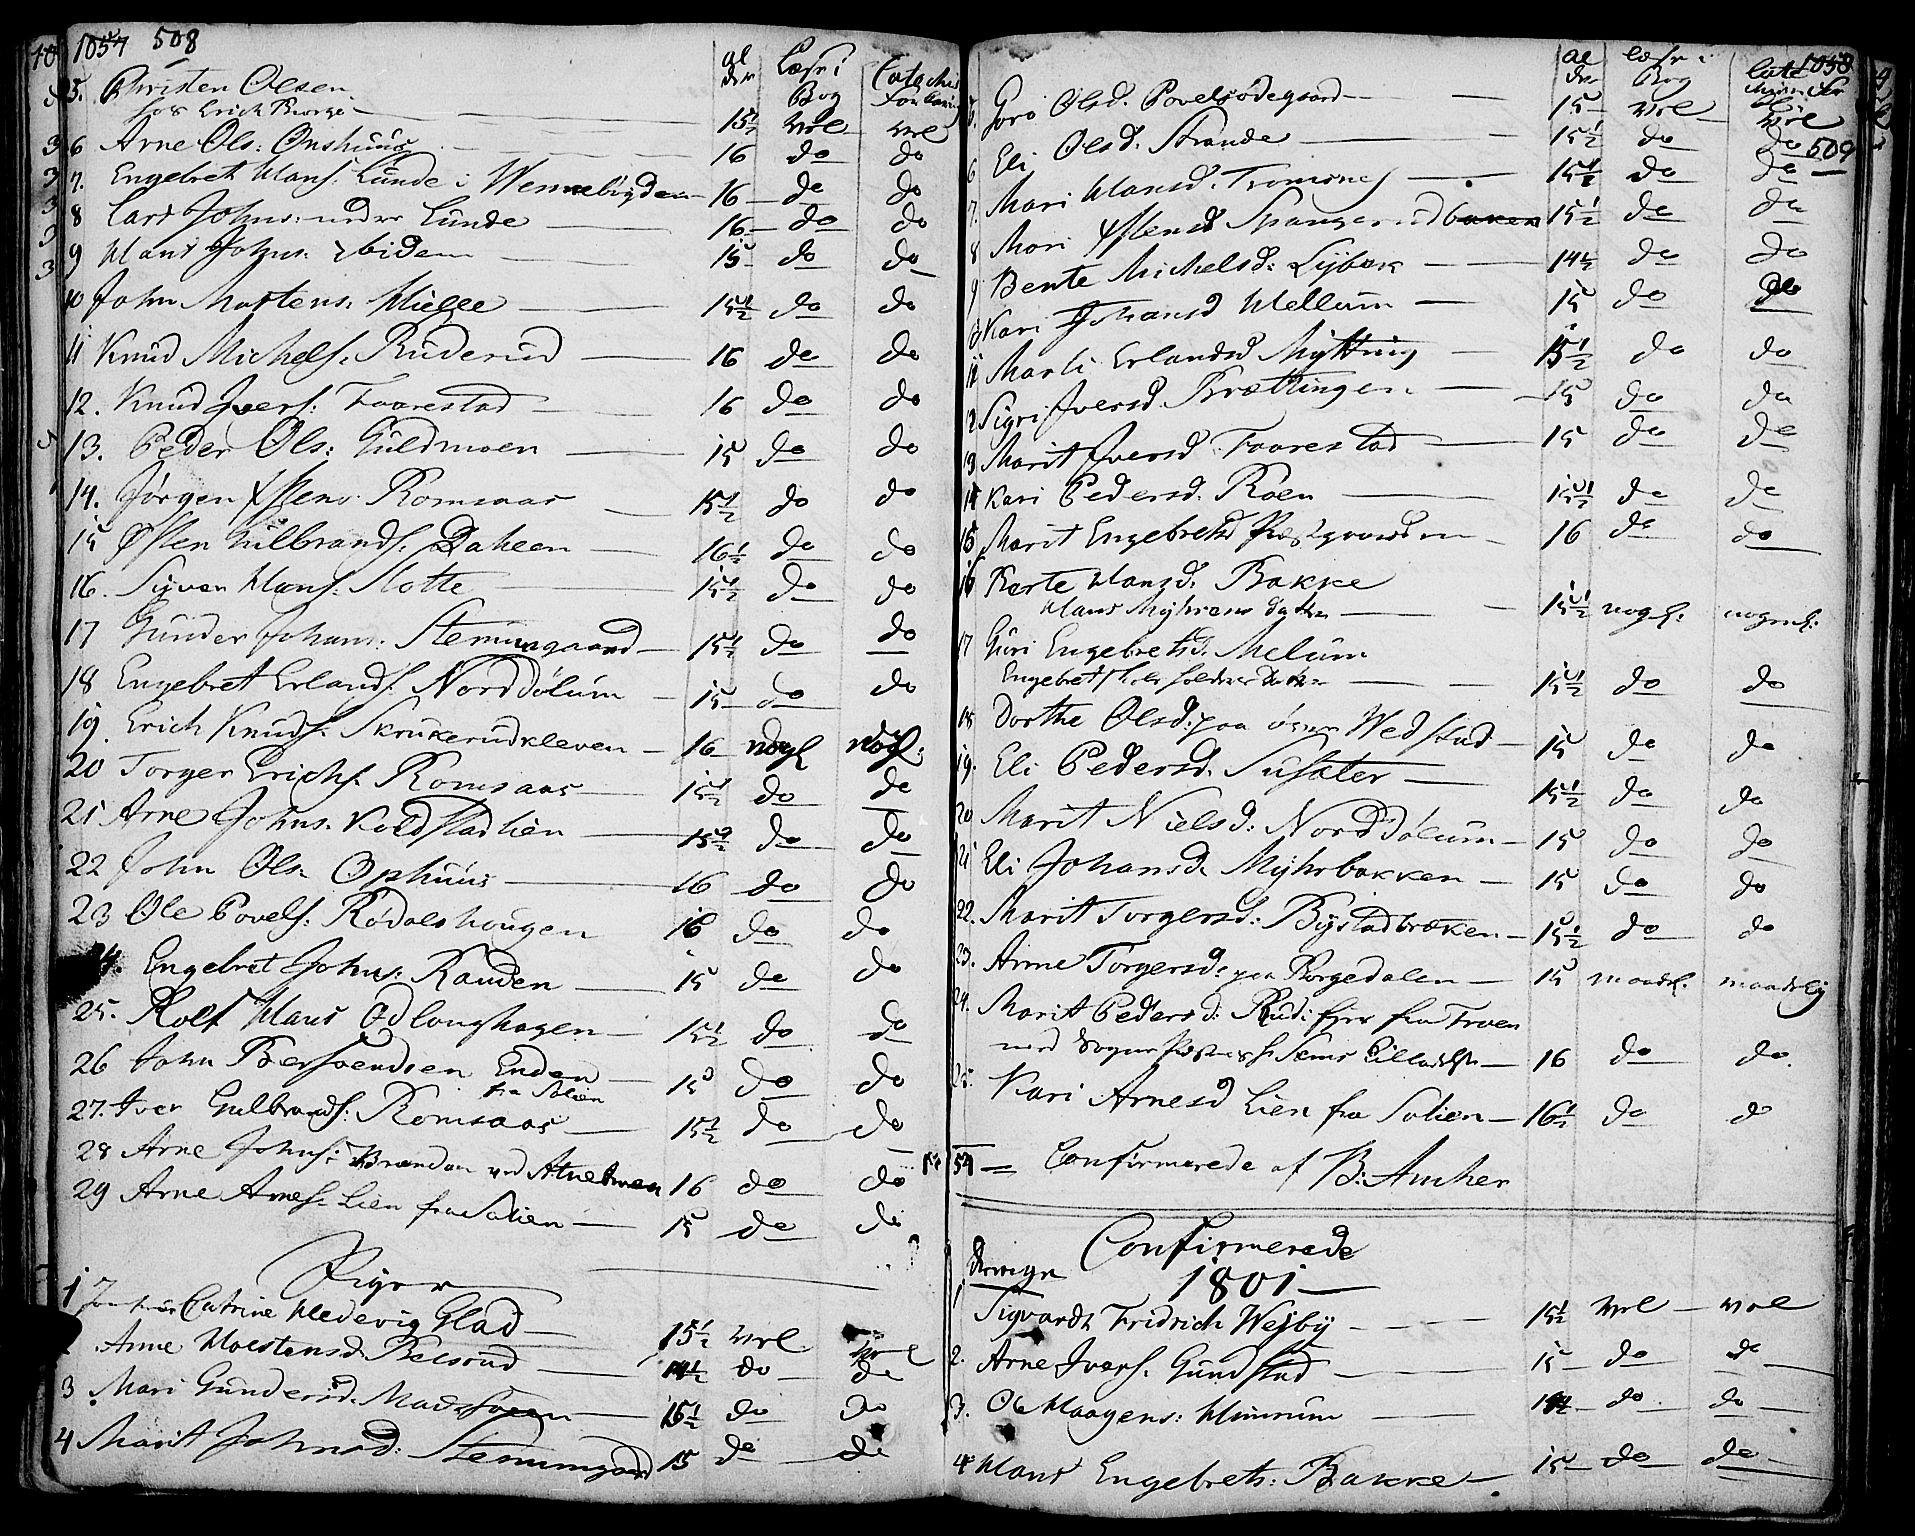 SAH, Ringebu prestekontor, Ministerialbok nr. 3, 1781-1820, s. 508-509